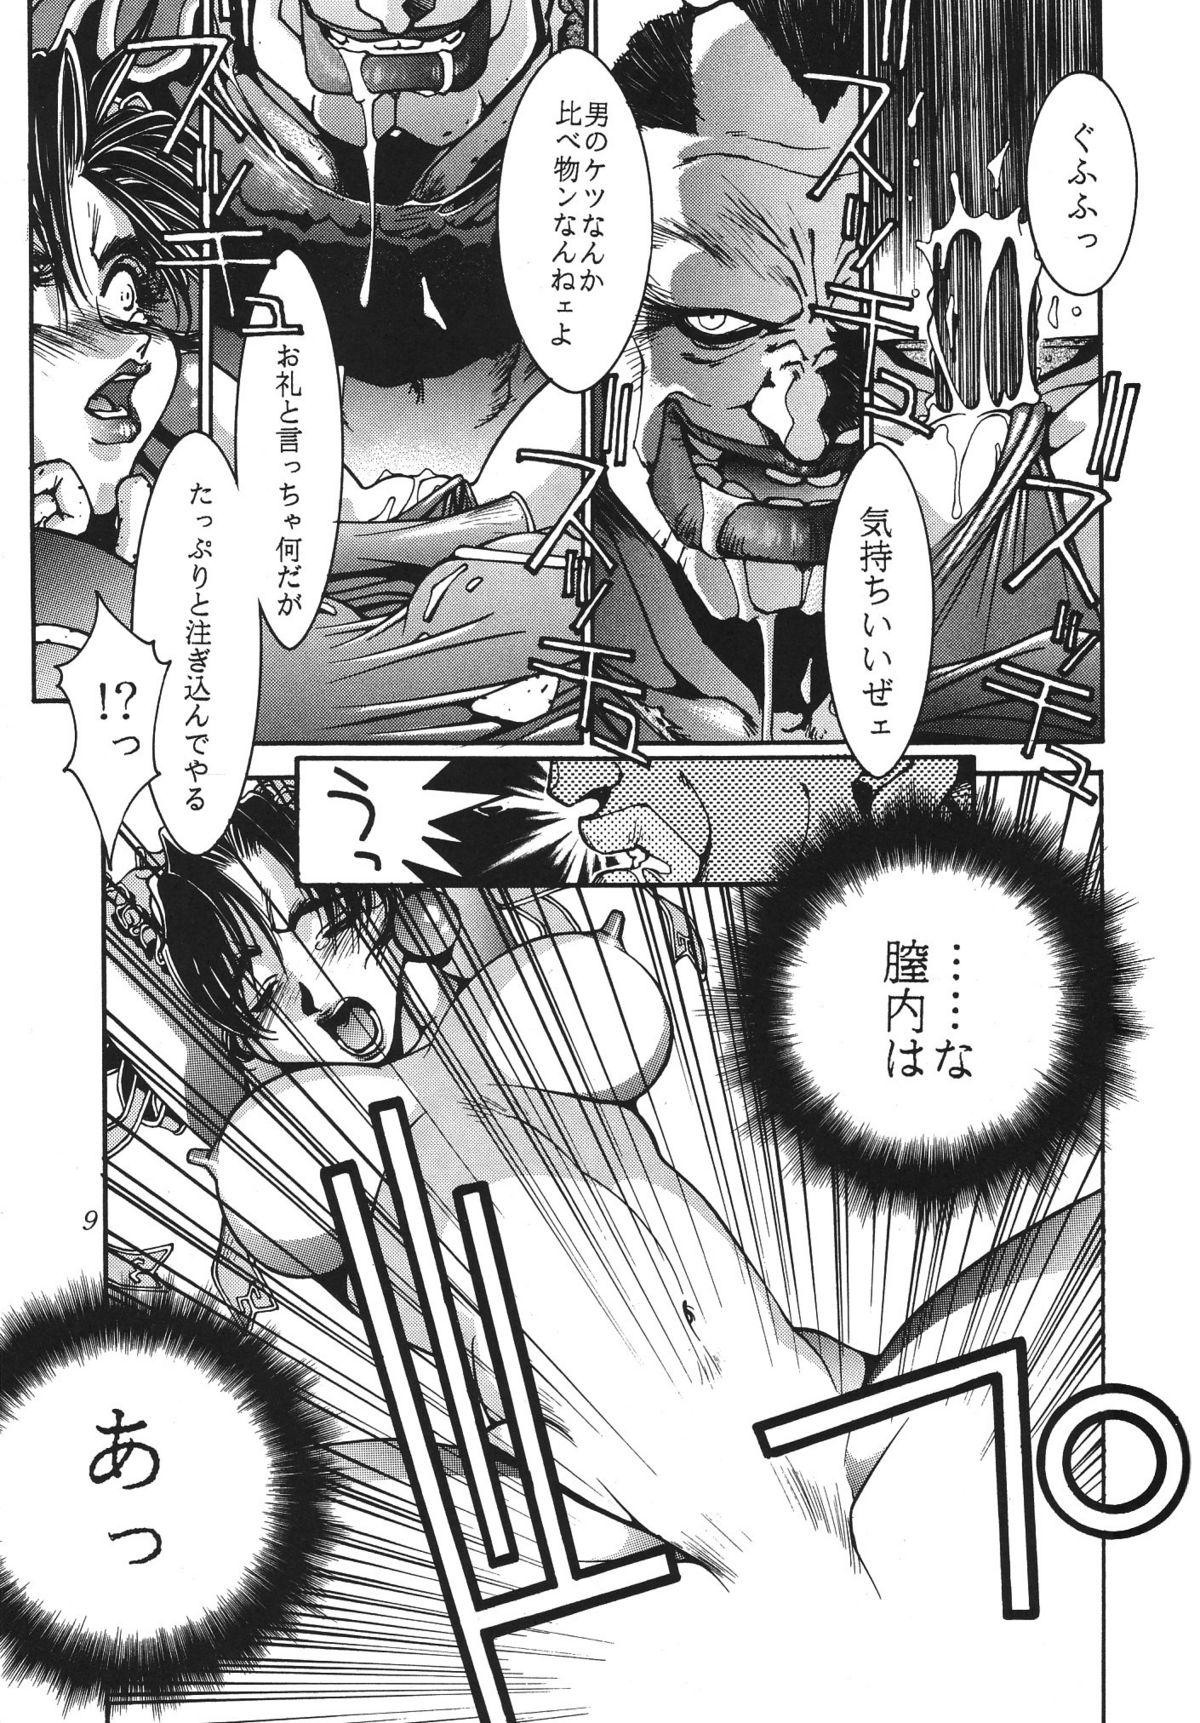 Kakutou Complete Gekan 9